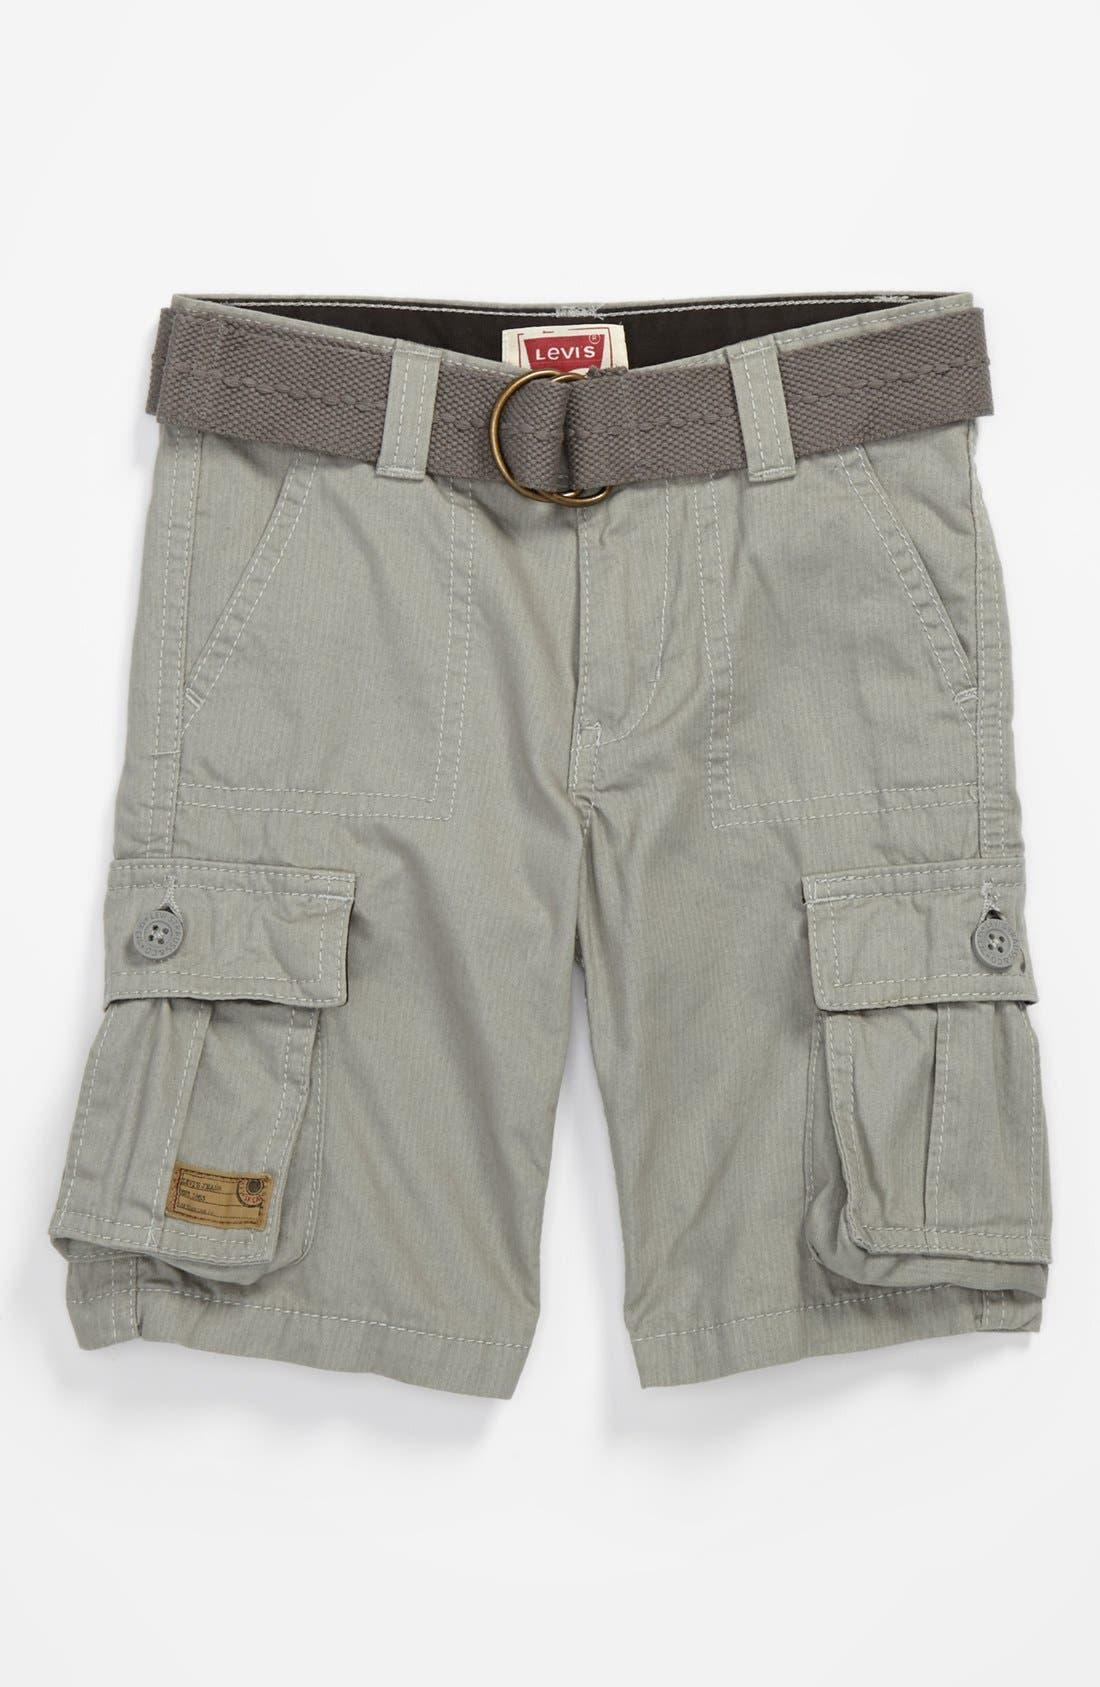 Alternate Image 1 Selected - Levi's® 'Maverick' Cargo Shorts (Toddler Boys)